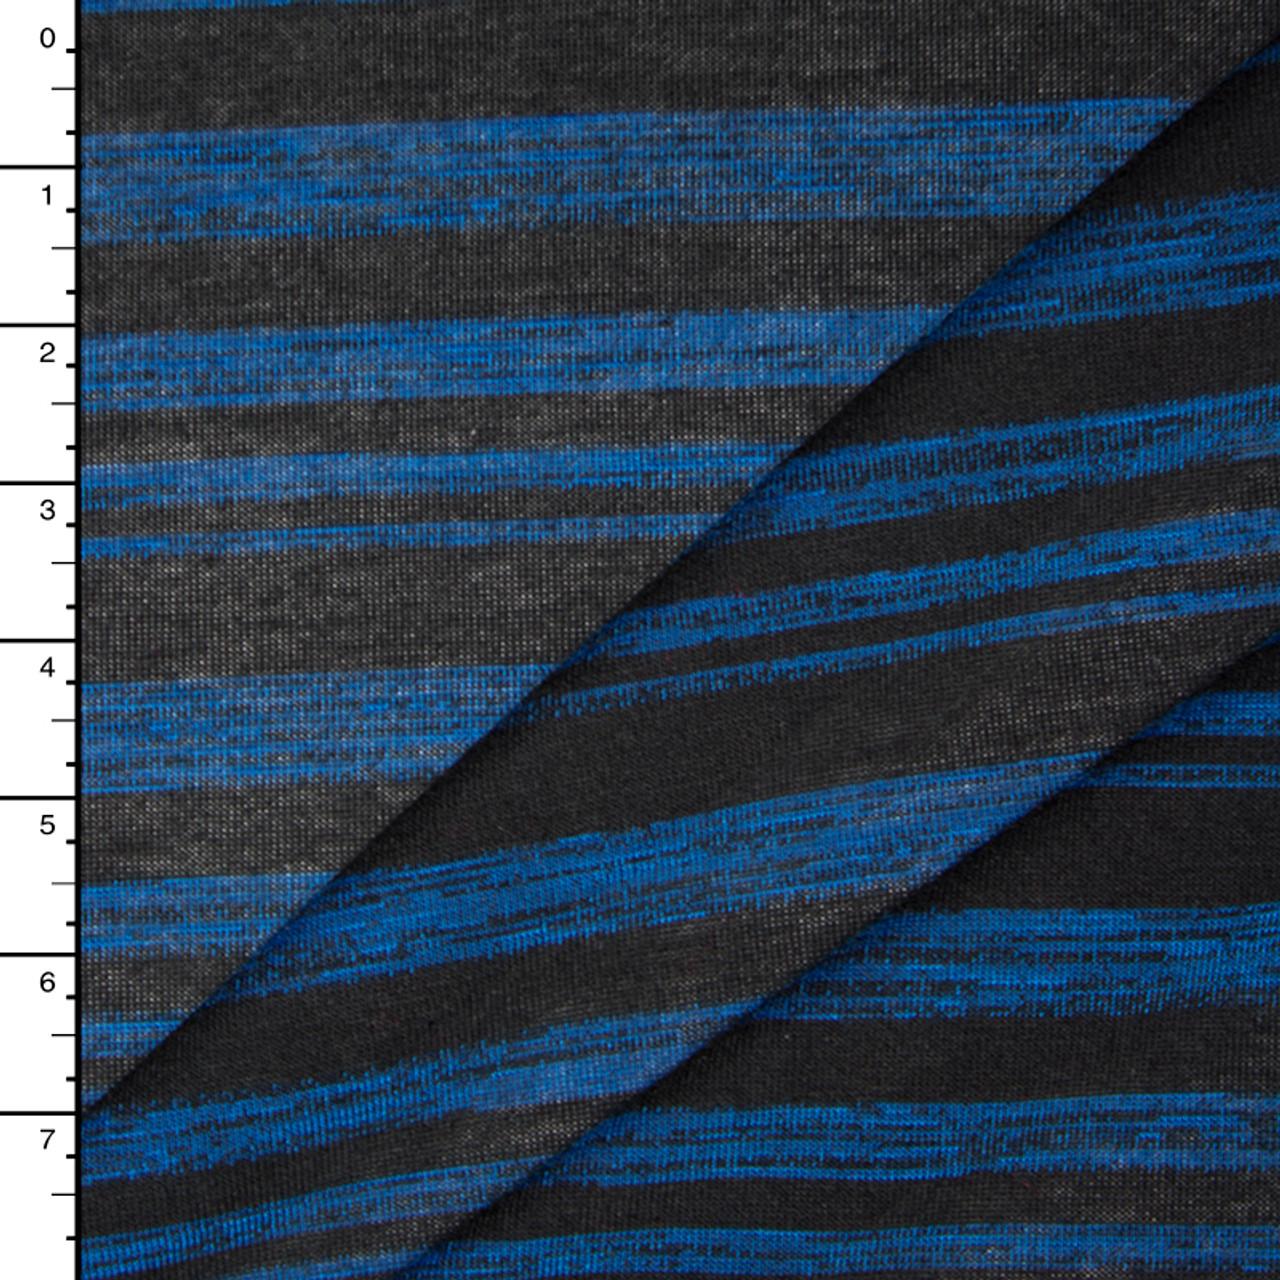 Bright Blue and Black Brush Stripe Hacci Sweater Knit